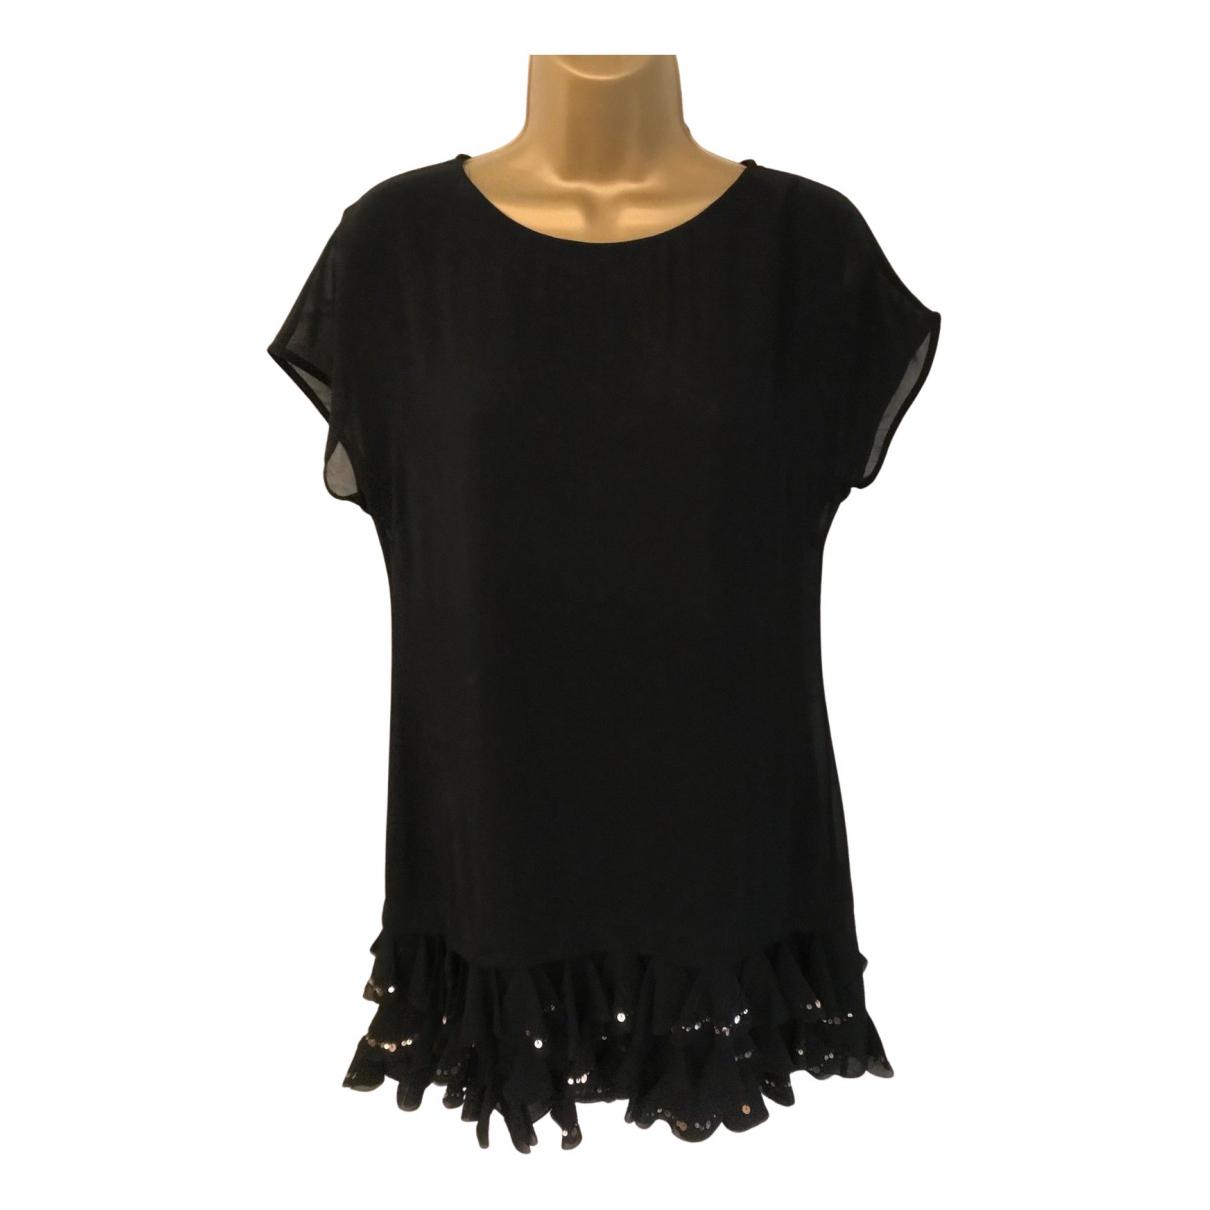 Ted Baker \N Kleid in  Schwarz Polyester